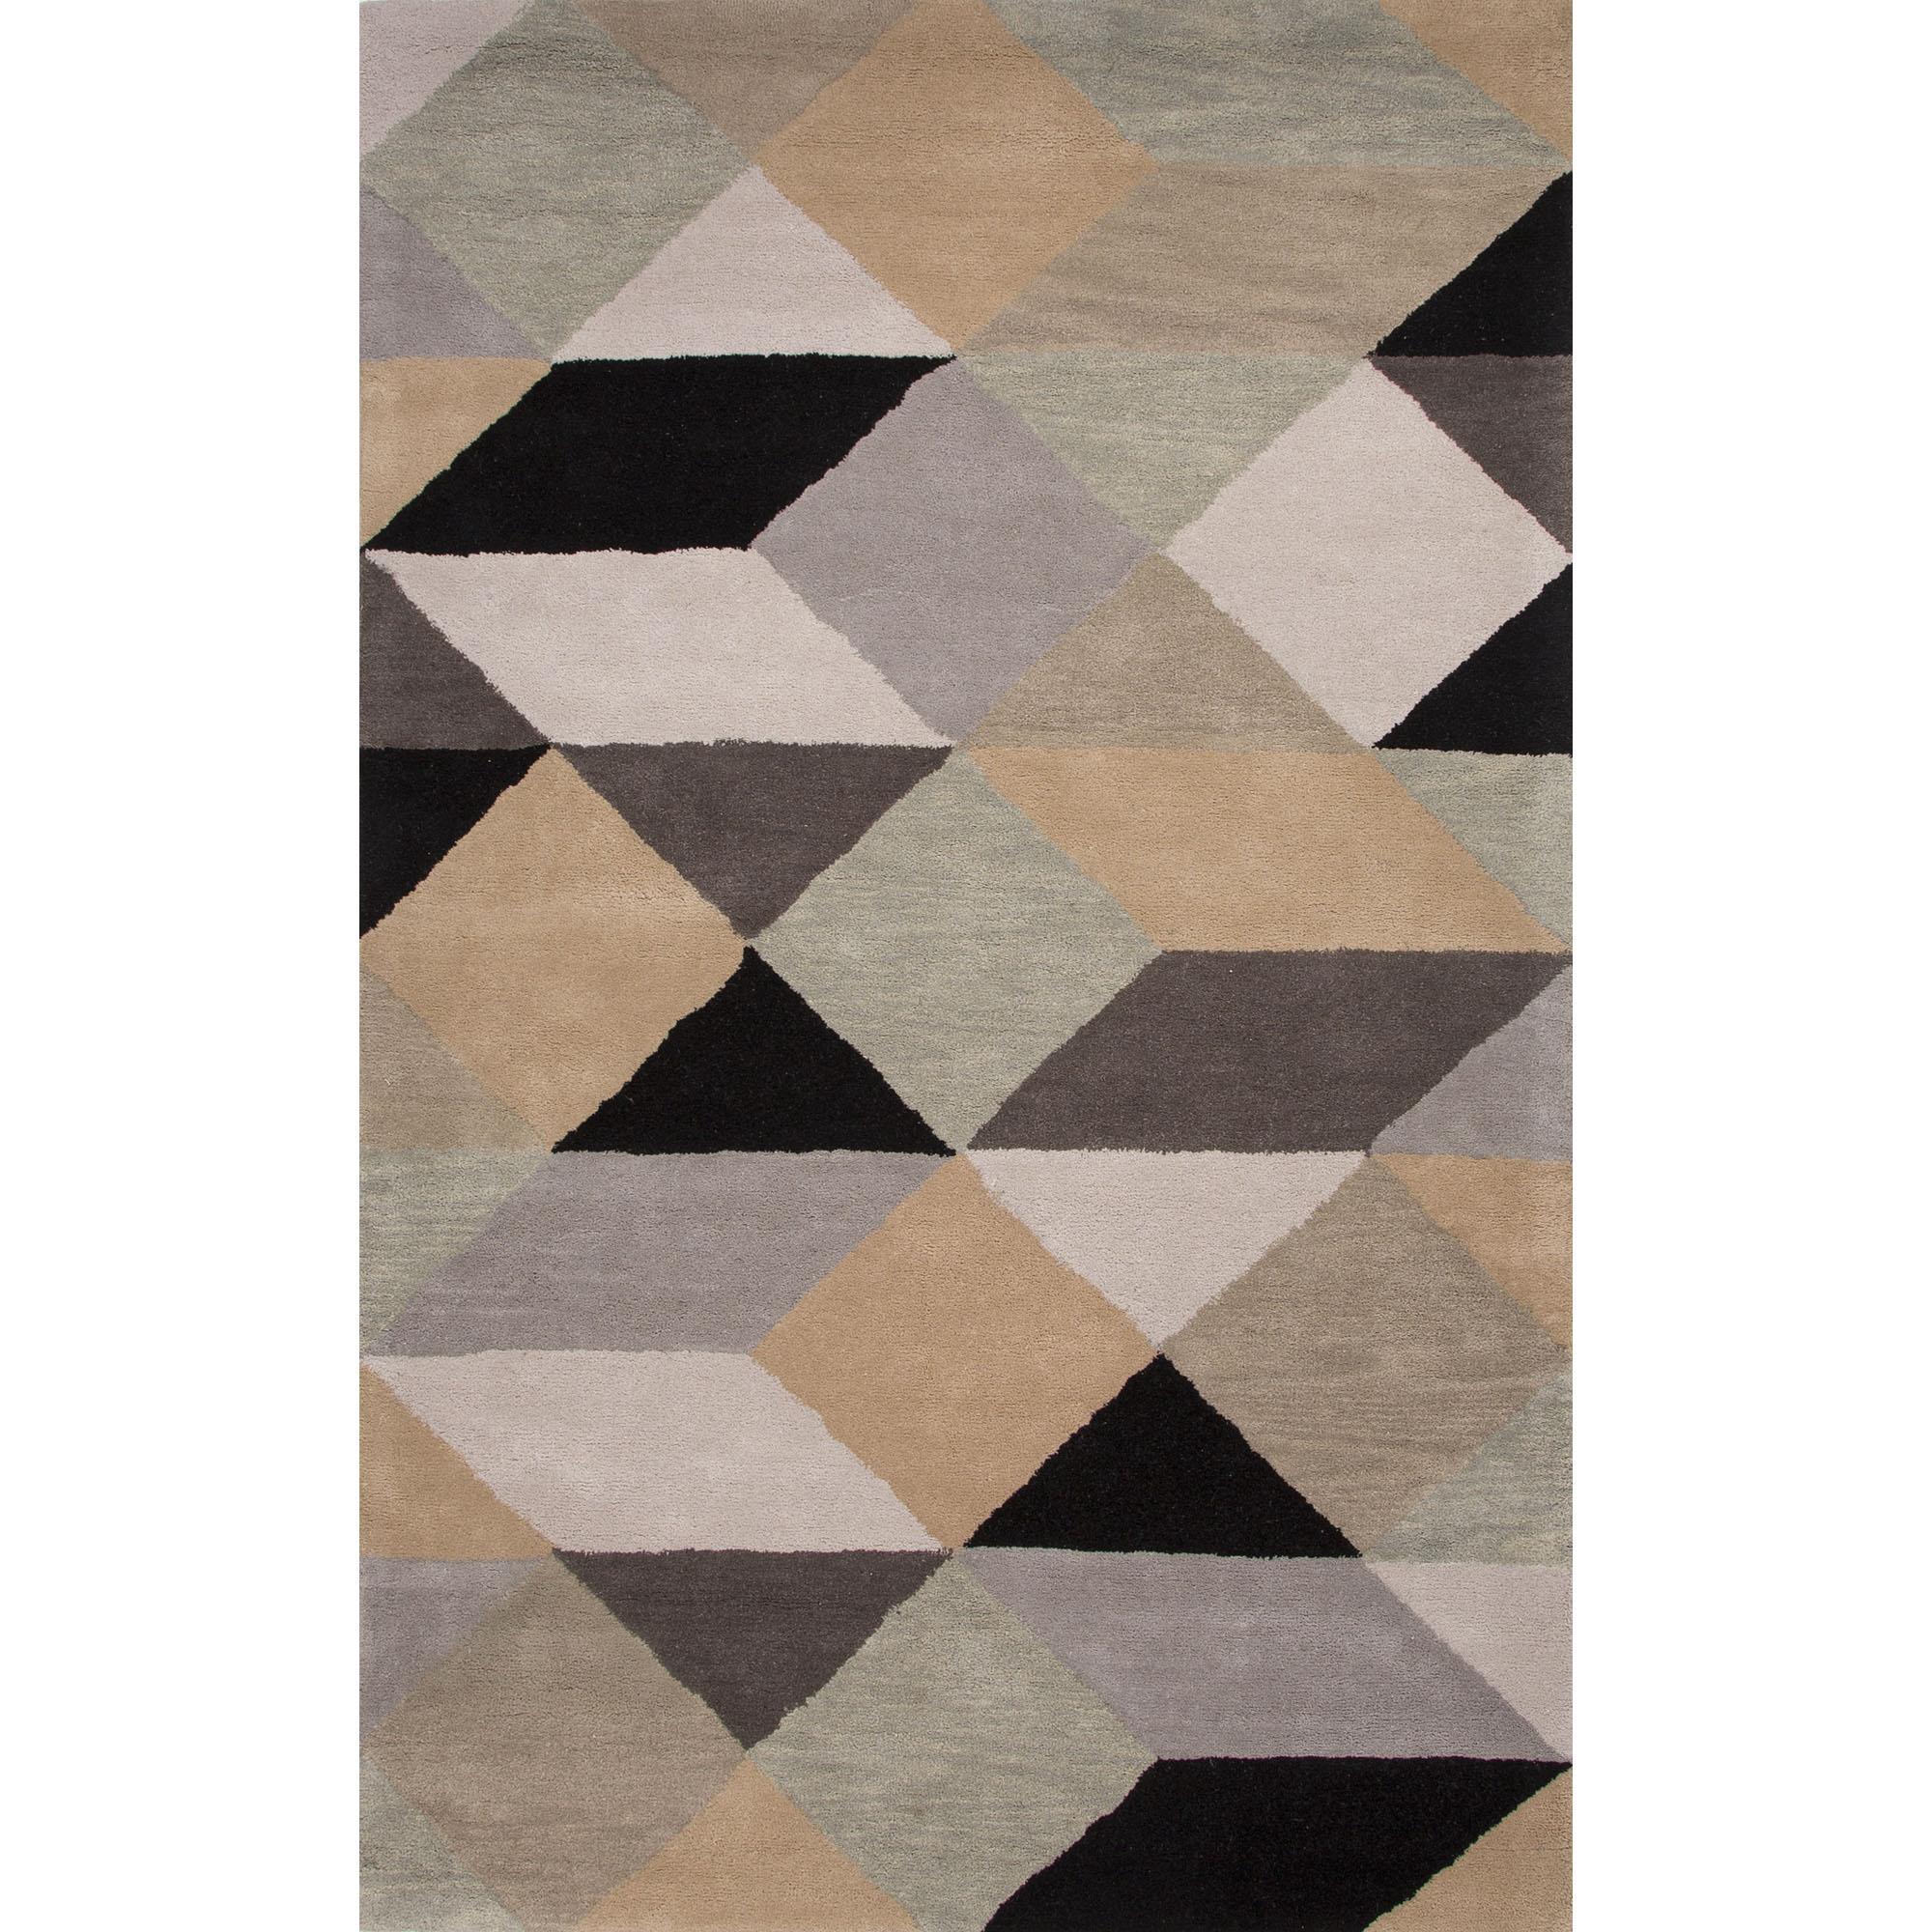 JAIPUR Rugs En Casa By Luli Sanchez Tufted 5 x 8 Rug - Item Number: RUG116018